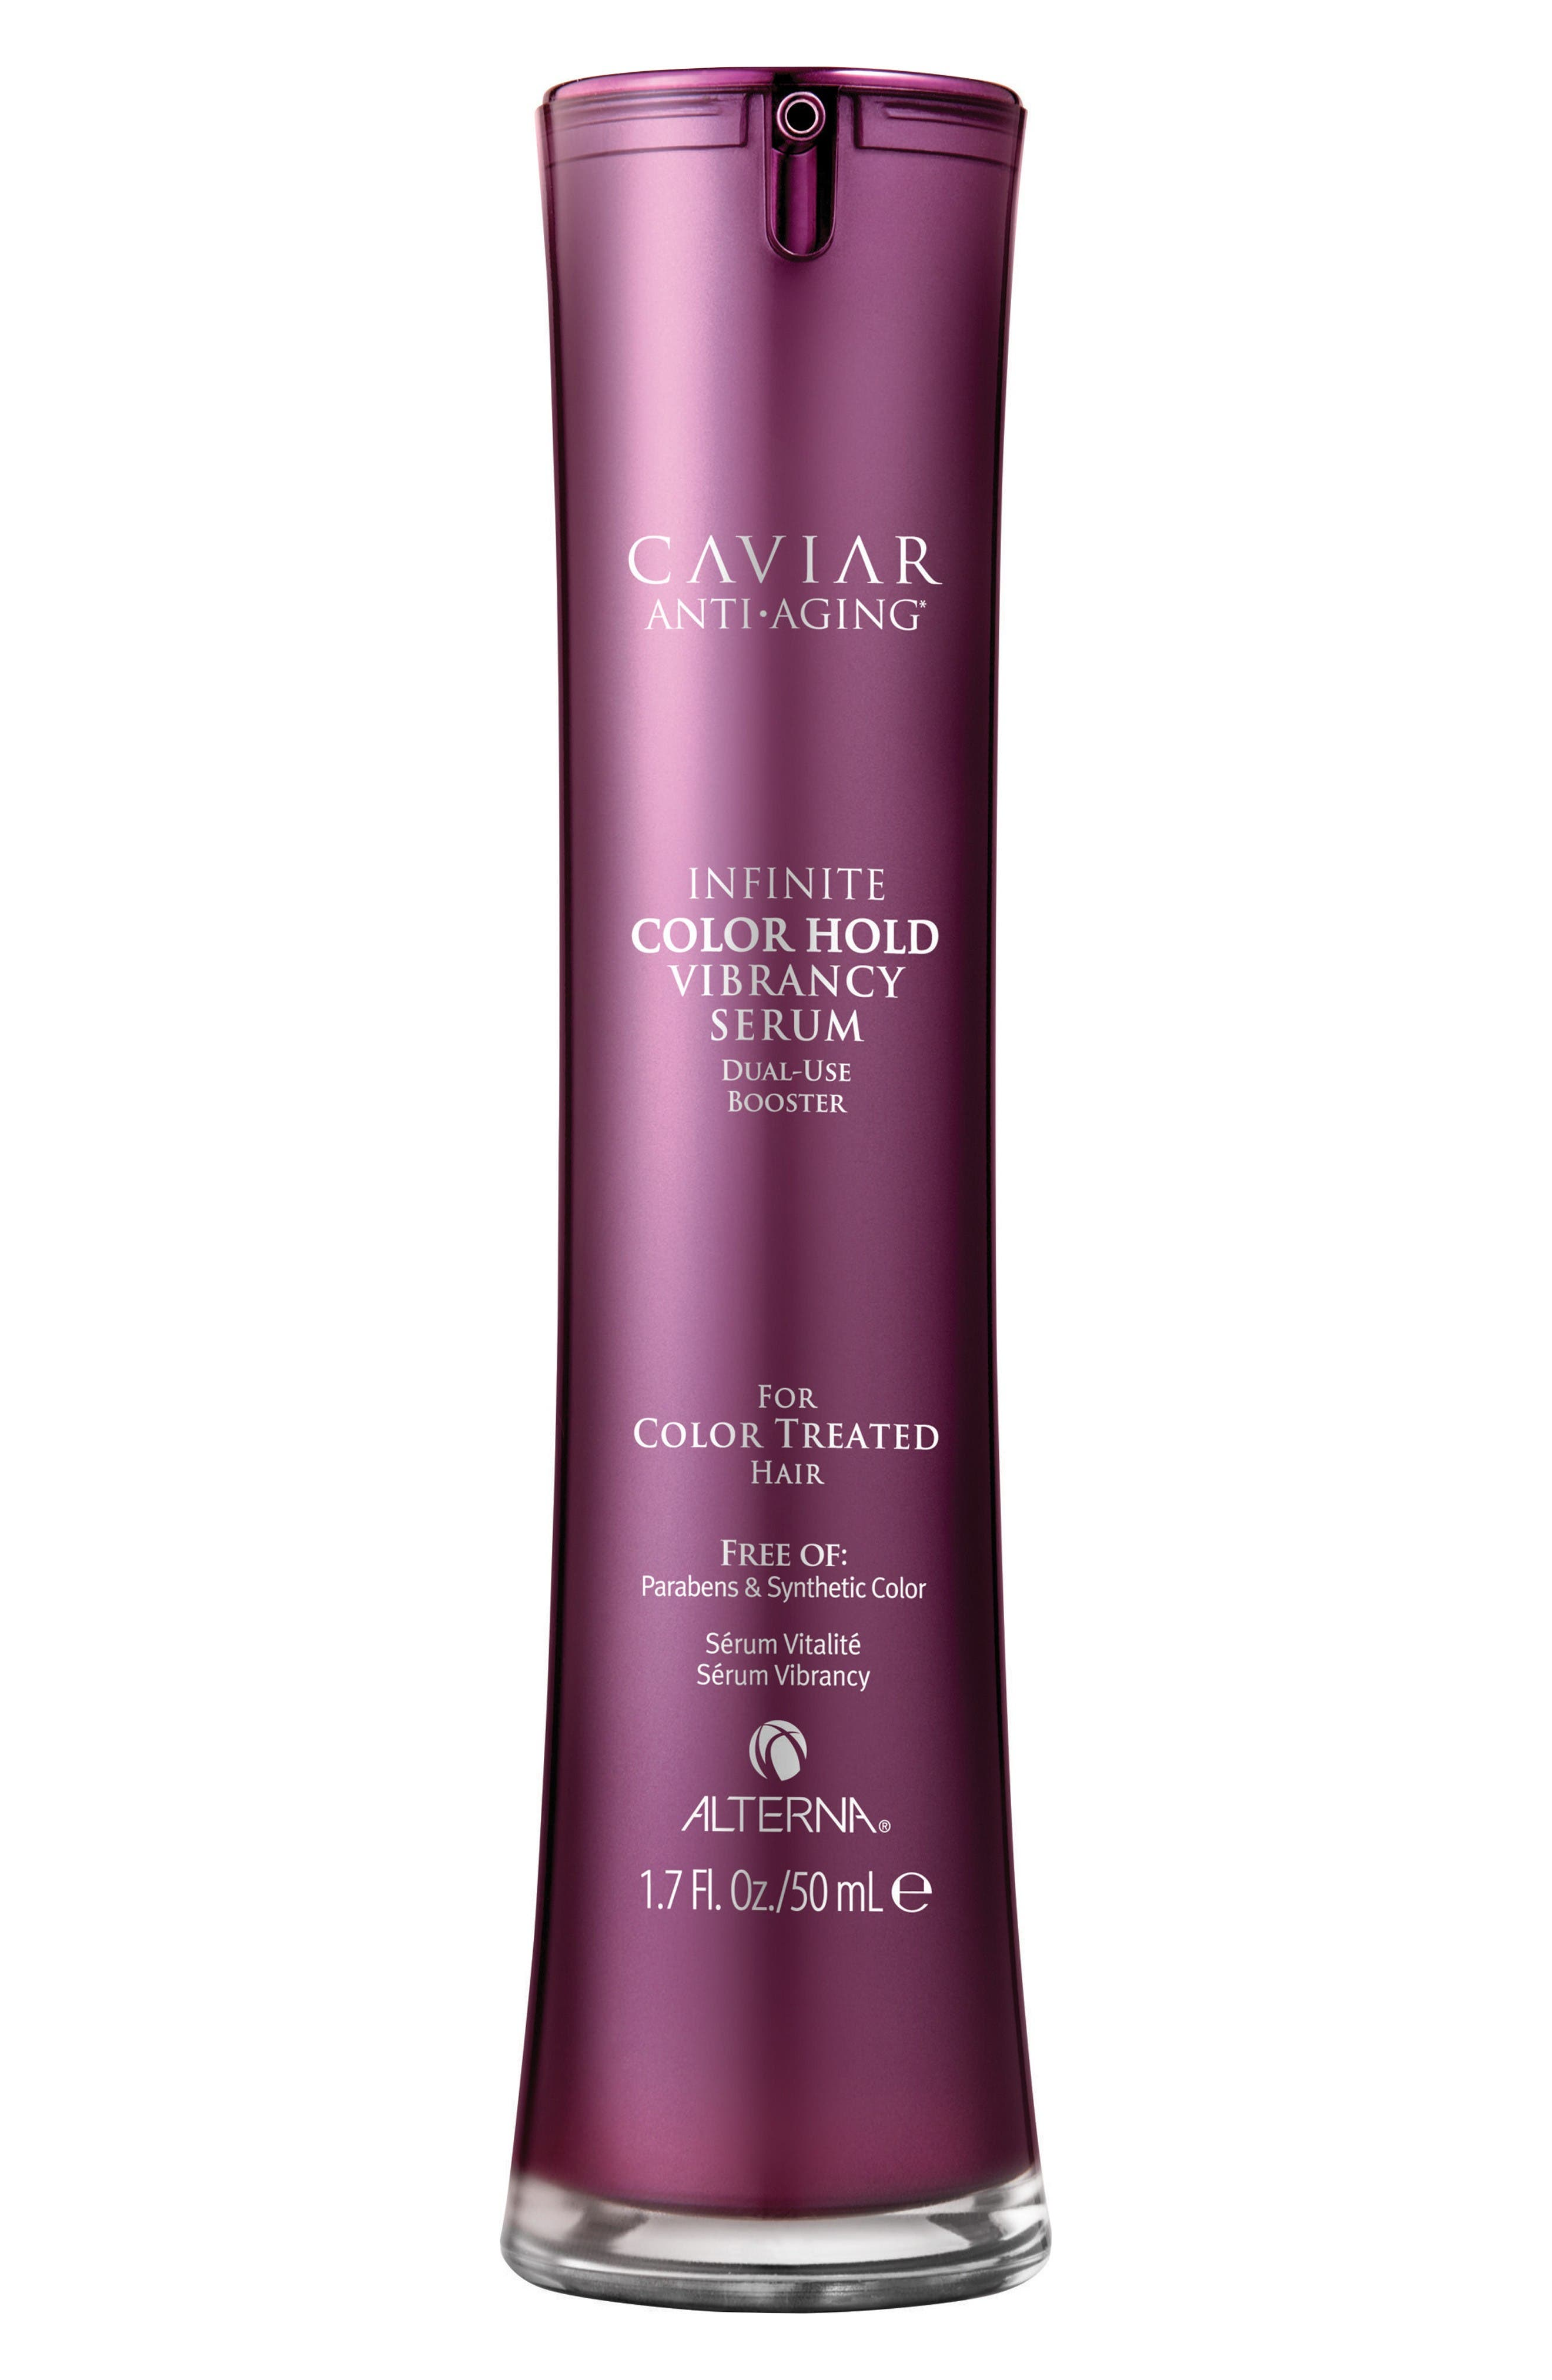 ALTERNA® Caviar Infinite Color Hold Vibrancy Serum